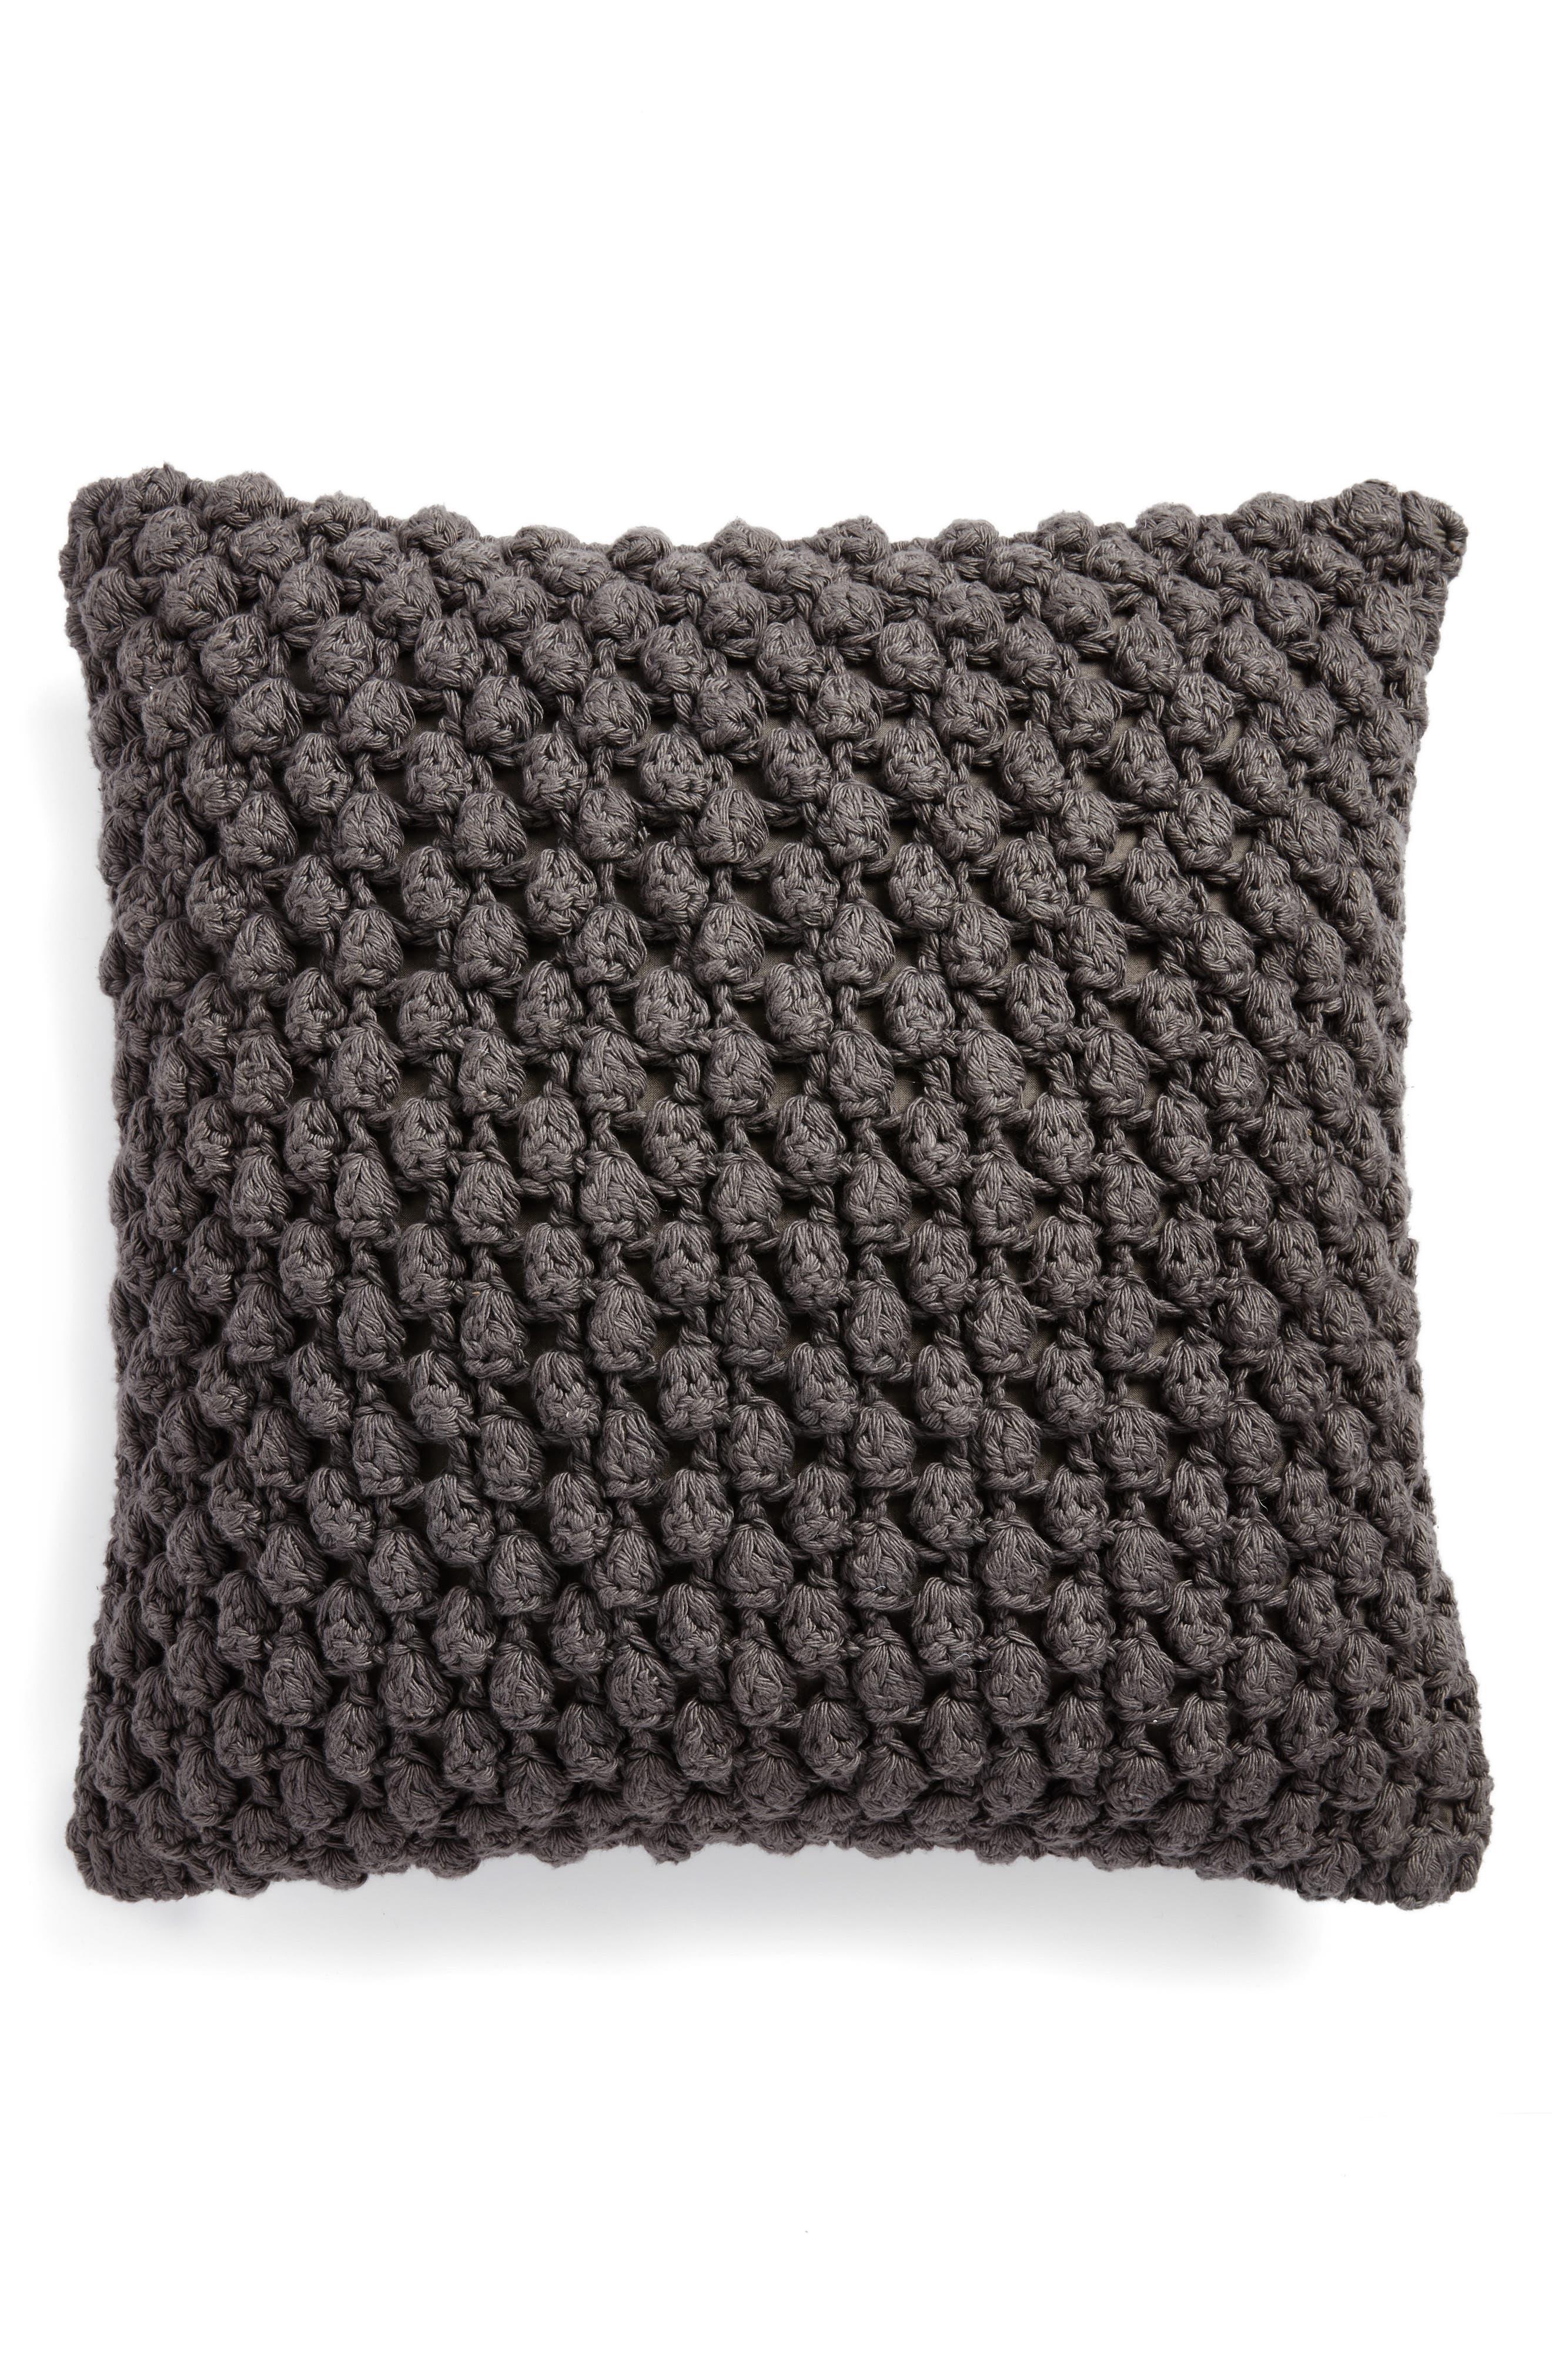 Pebble Knit Accent Pillow,                             Main thumbnail 1, color,                             Grey Onyx